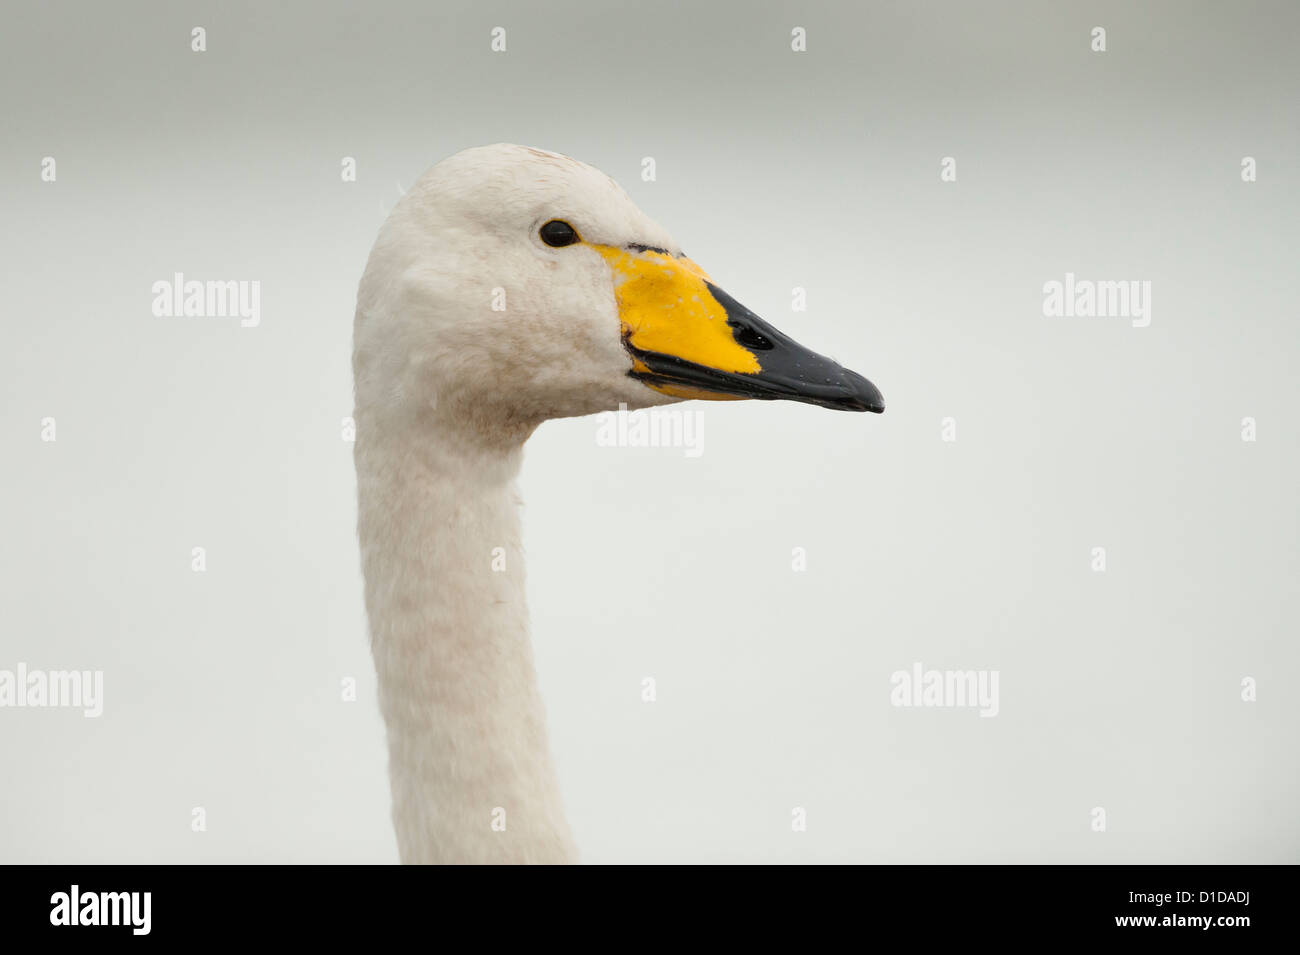 Ein Singschwan, fotografiert auf dem Fluß Doon, Schottland. Stockbild